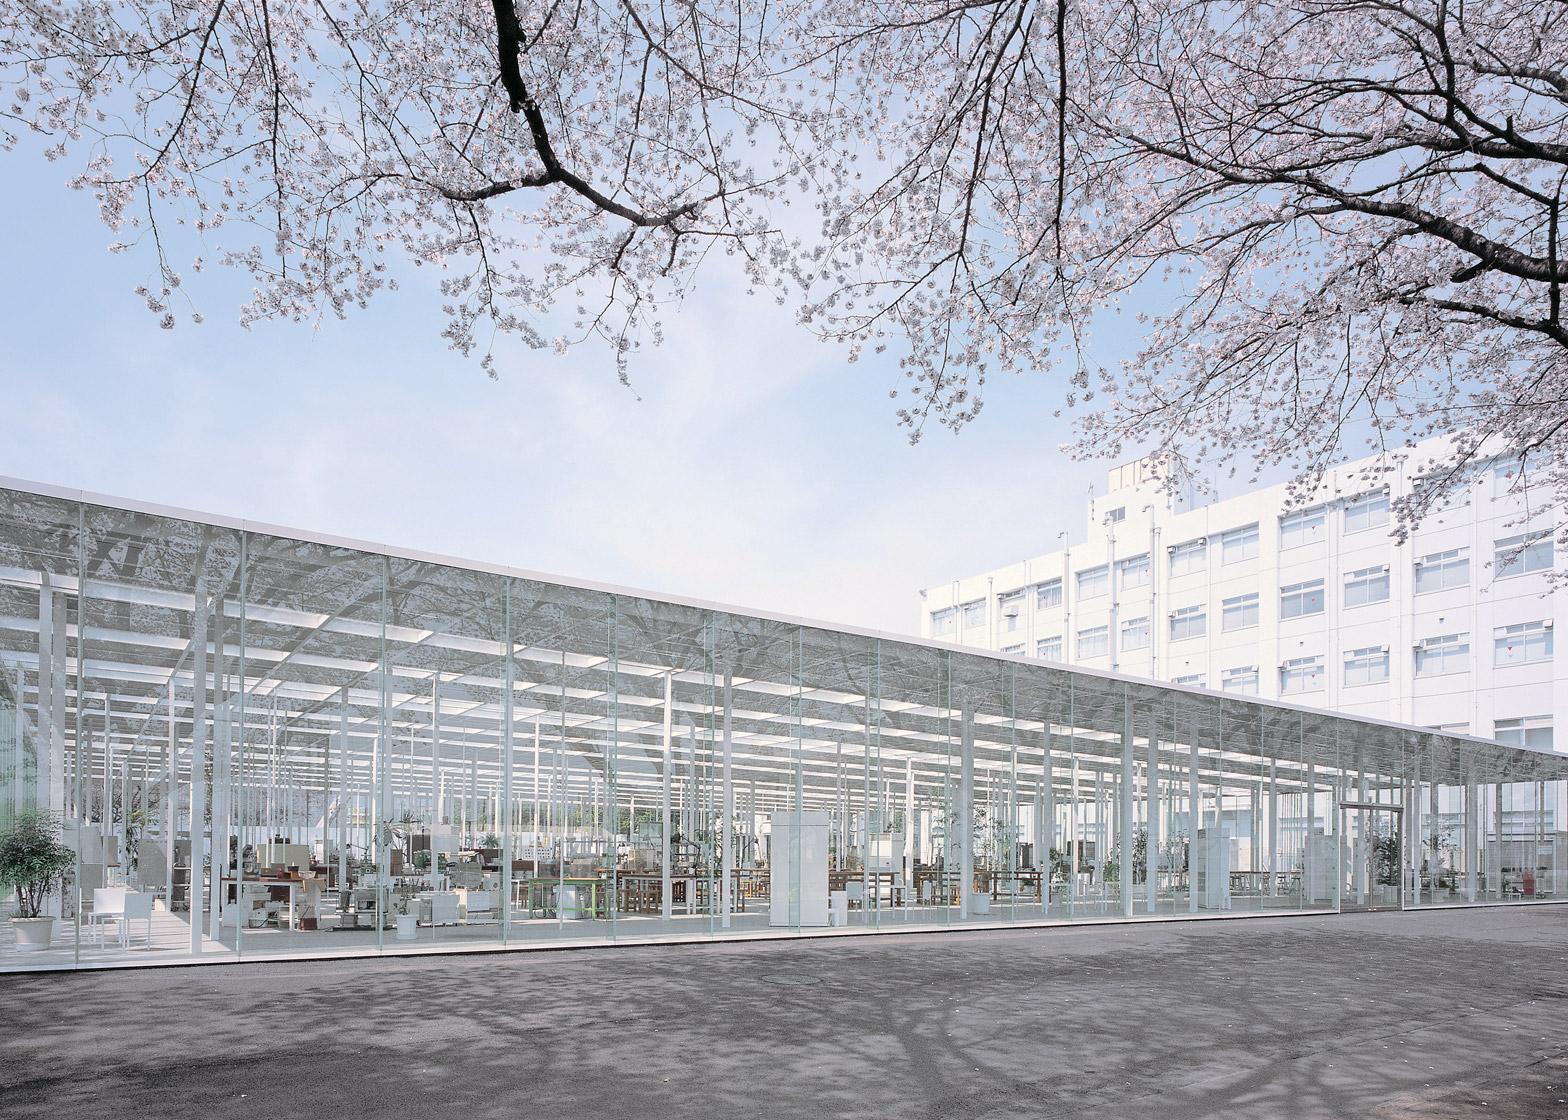 Kanagawa Institute of Technology Workshop, Kanagawa, Japan by Junya Ishigami, 2005–2008